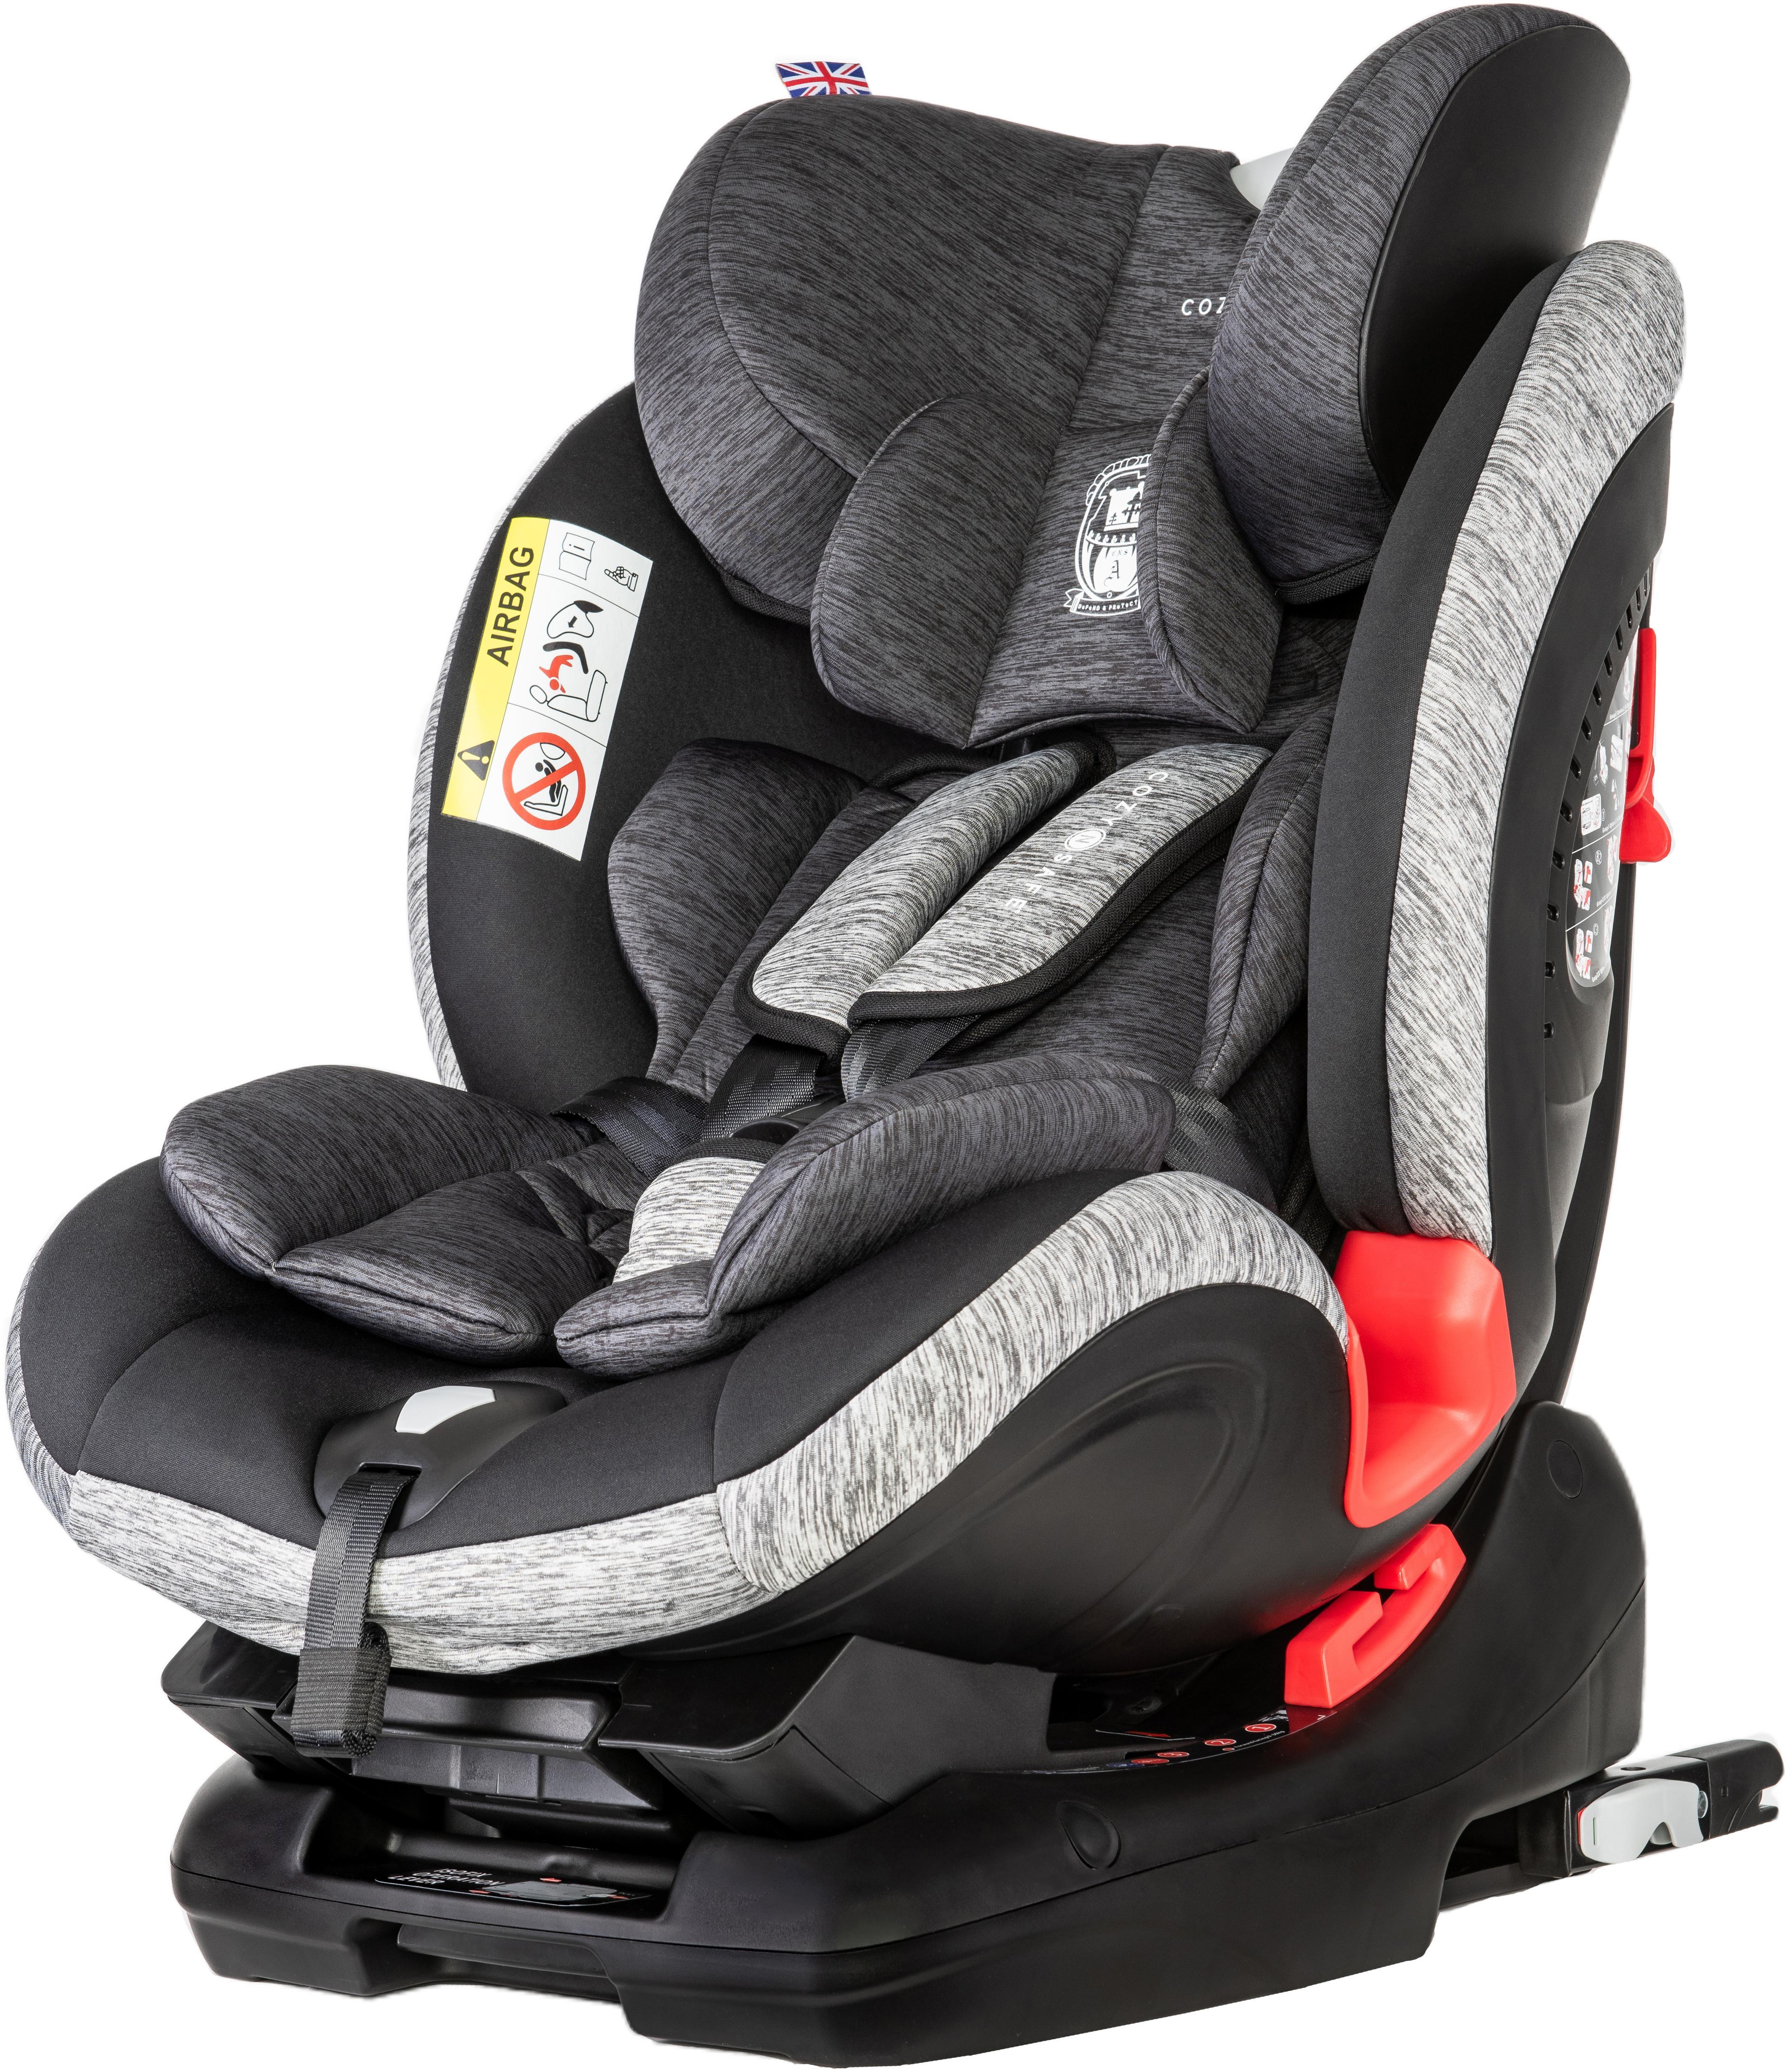 Cozy N Safe Arthur Car Seat